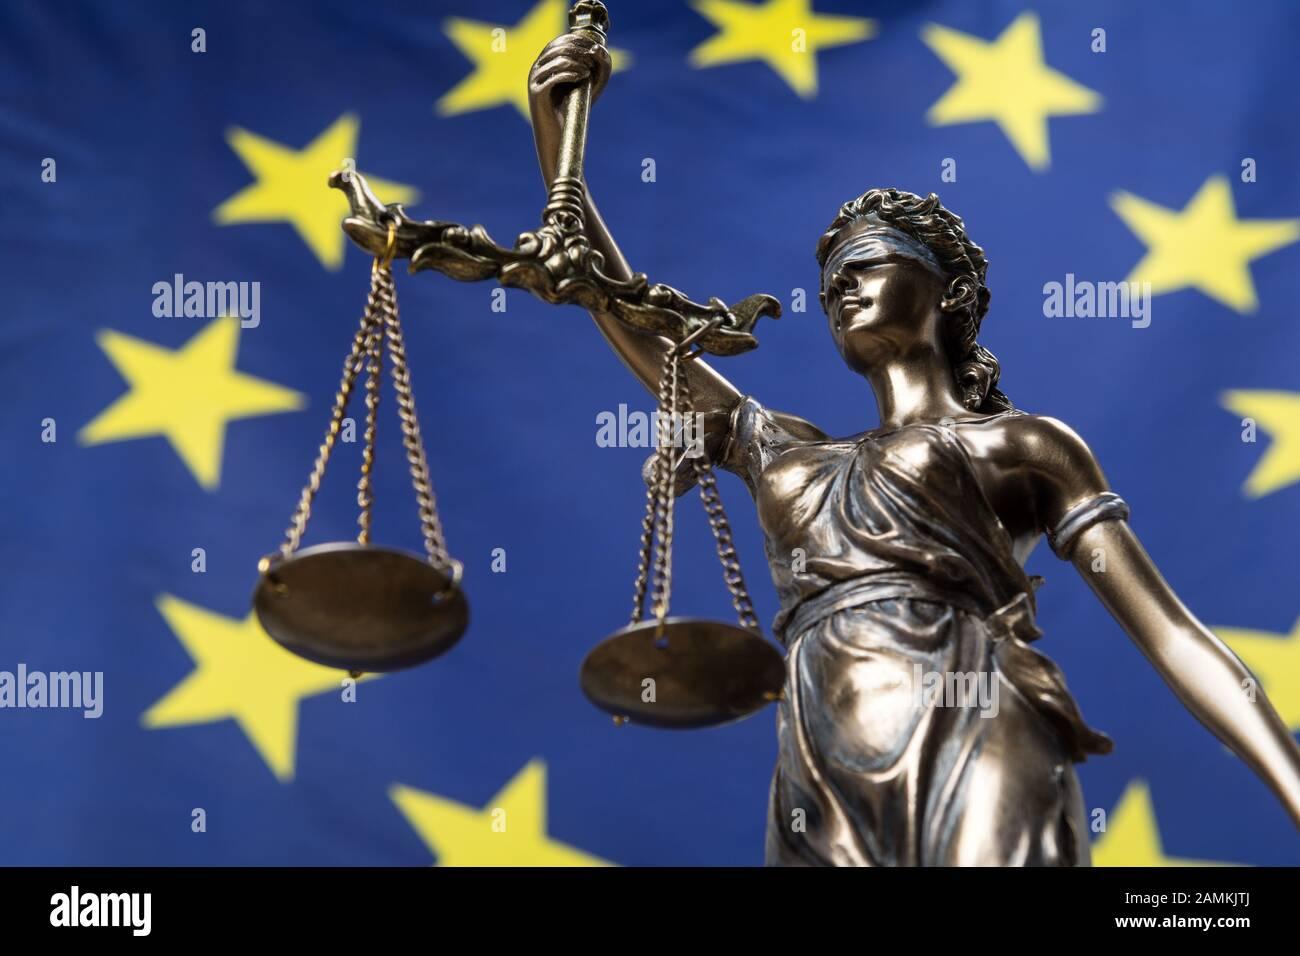 Estatua de la diosa ciega de la justicia Themis o Justitia, contra una bandera europea, como concepto legal Foto de stock